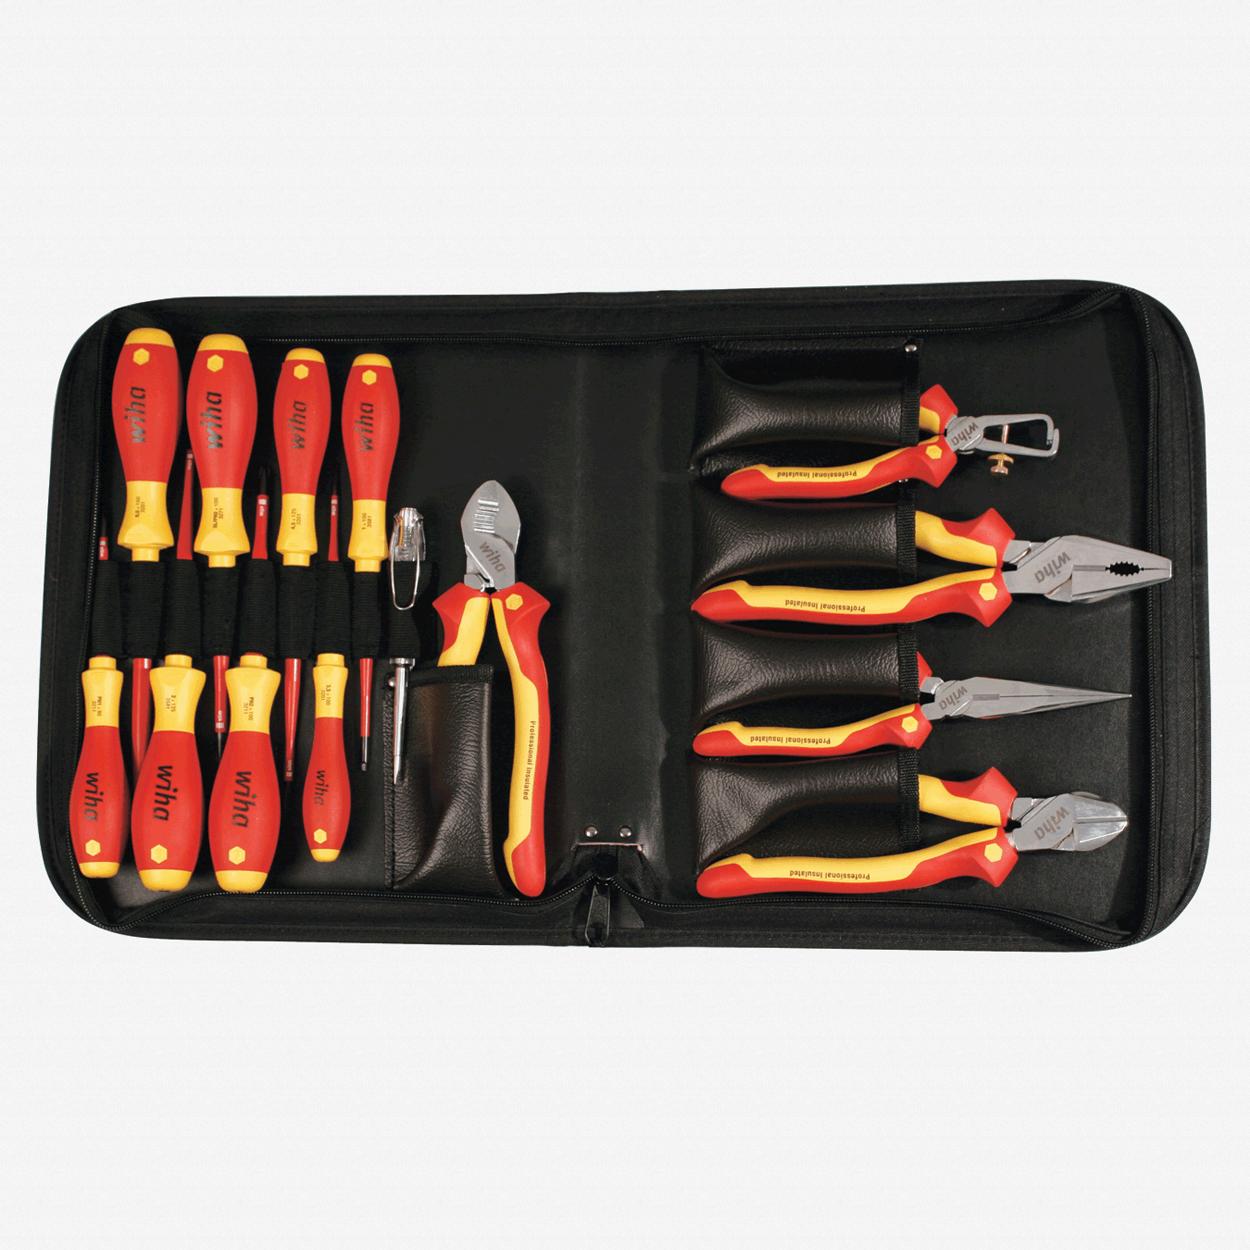 Wiha 32869 14 Piece SlimLine Insulated Pliers/Driver Zipper Case Set - KC Tool